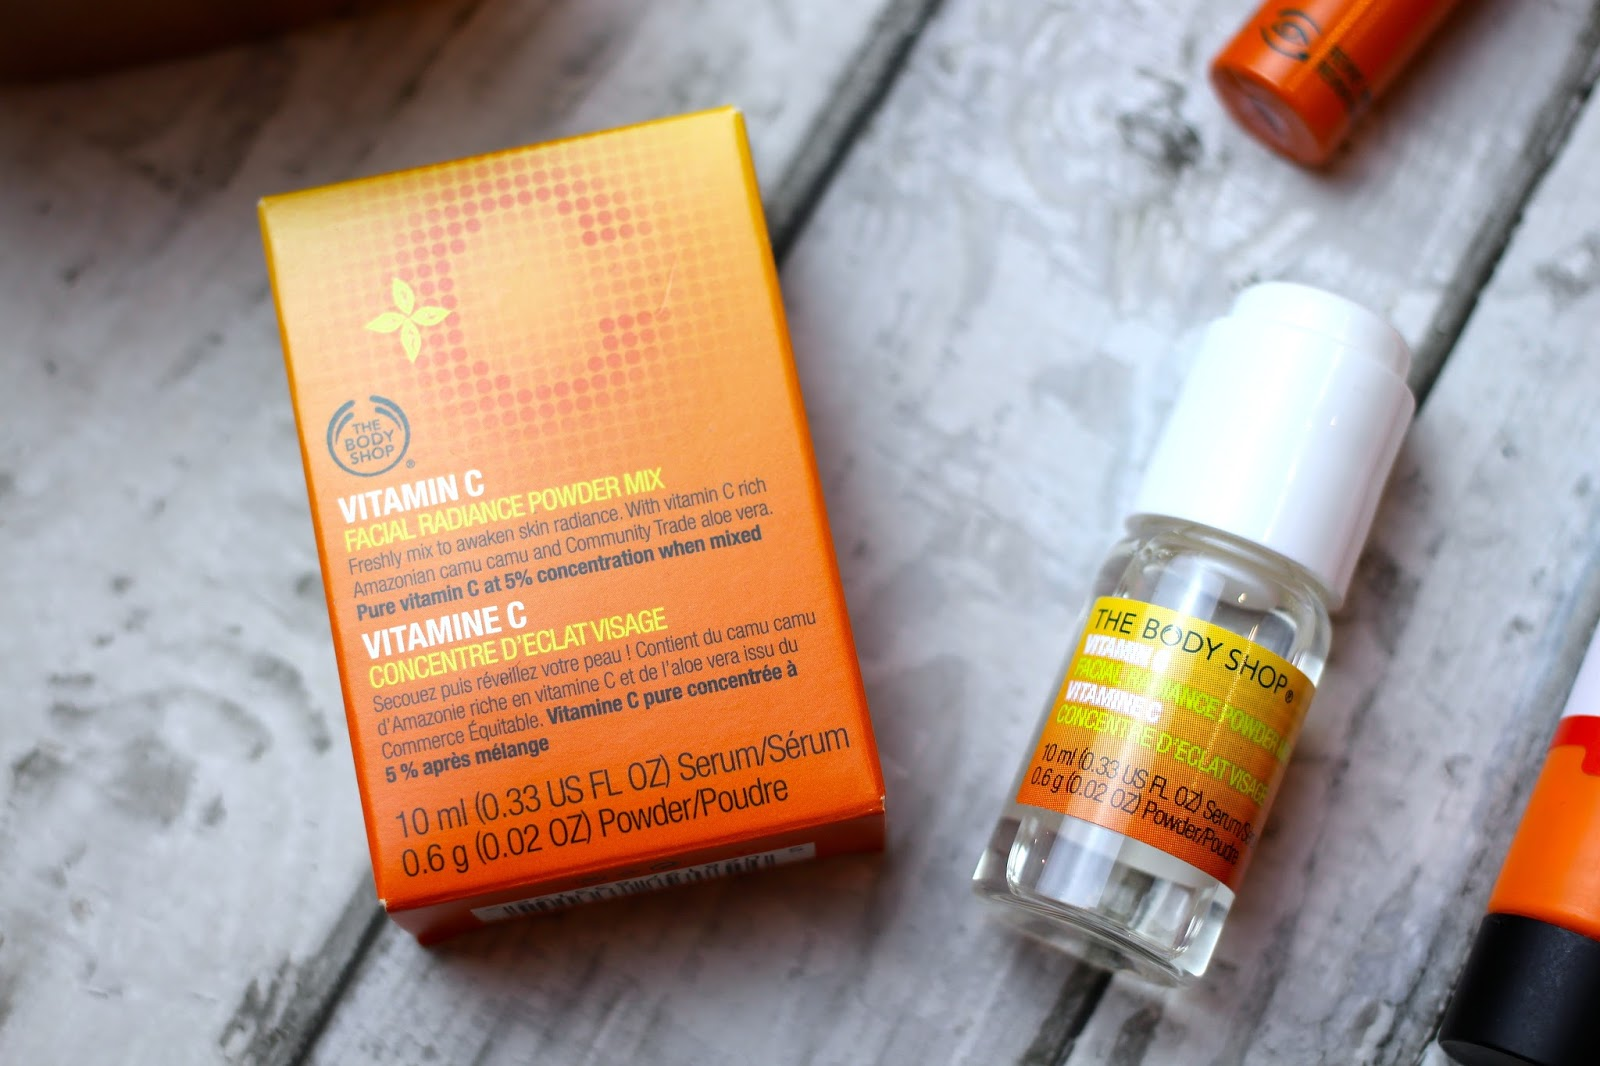 body shop vitamin c powder mix review